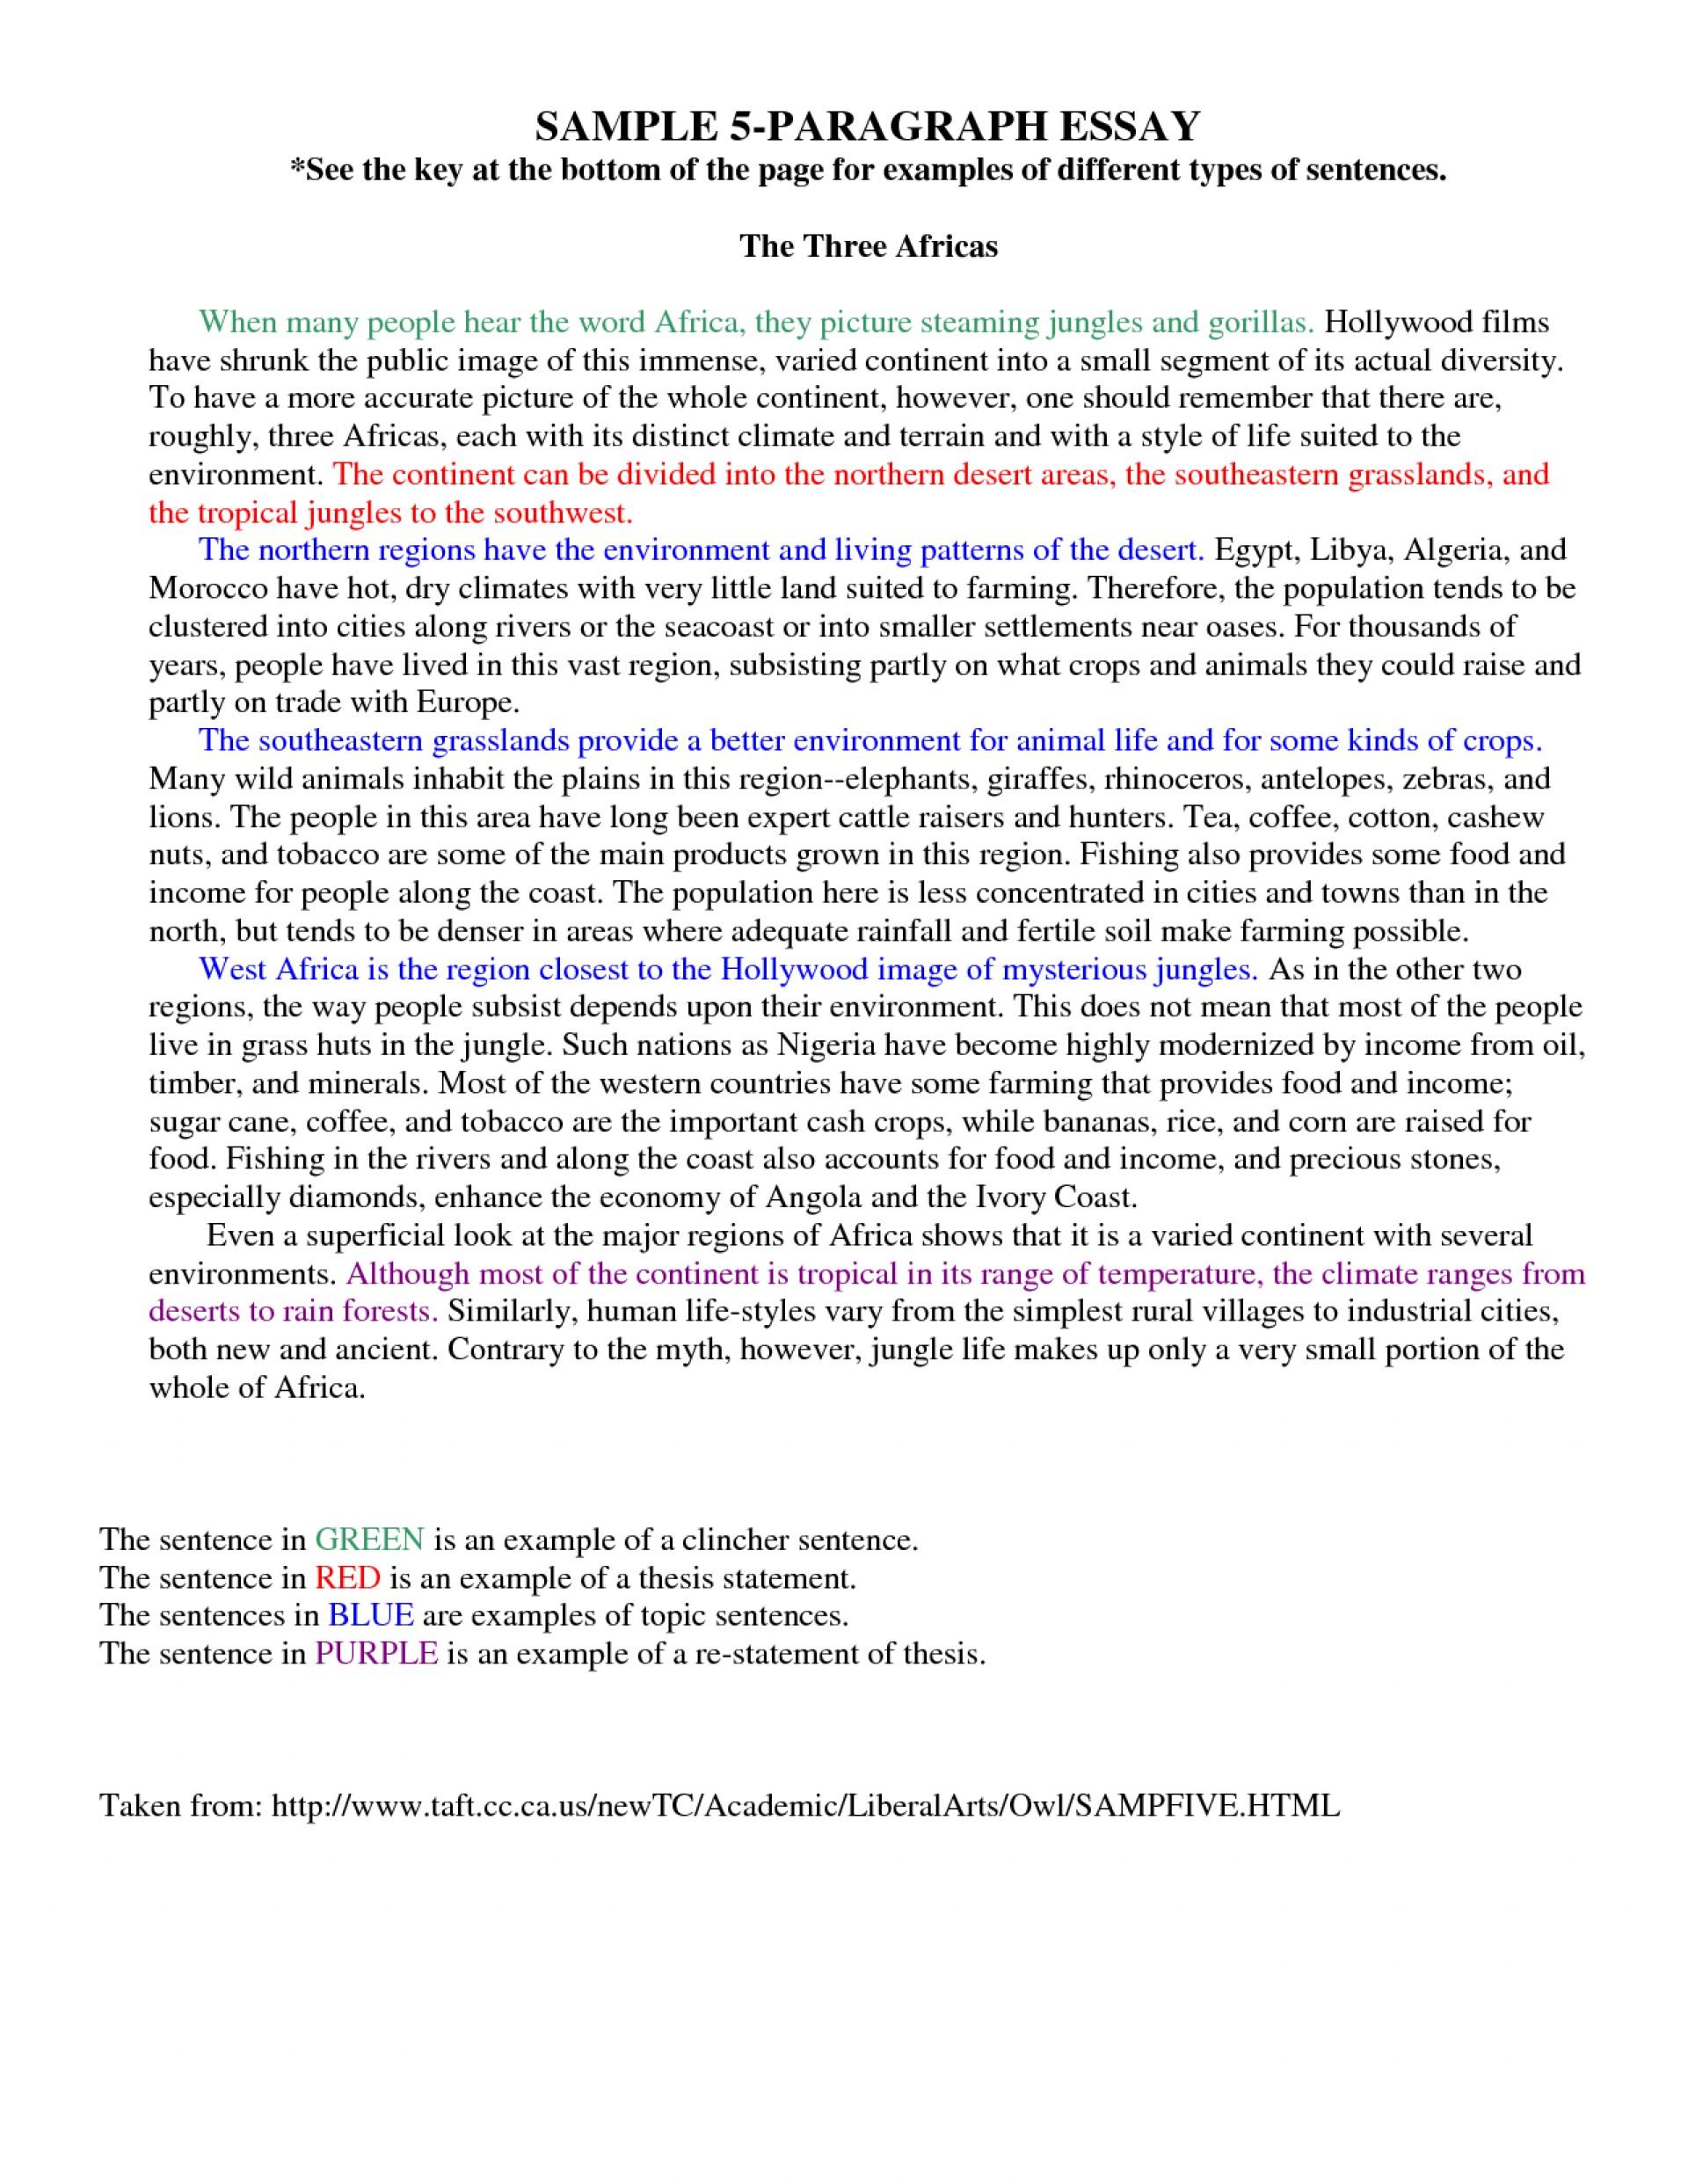 011 Essay Example Format Of Paragraph Sample Dicom Tester Cover Letter Stirring 5 High School Pdf Argumentative Outline Template Five 1920